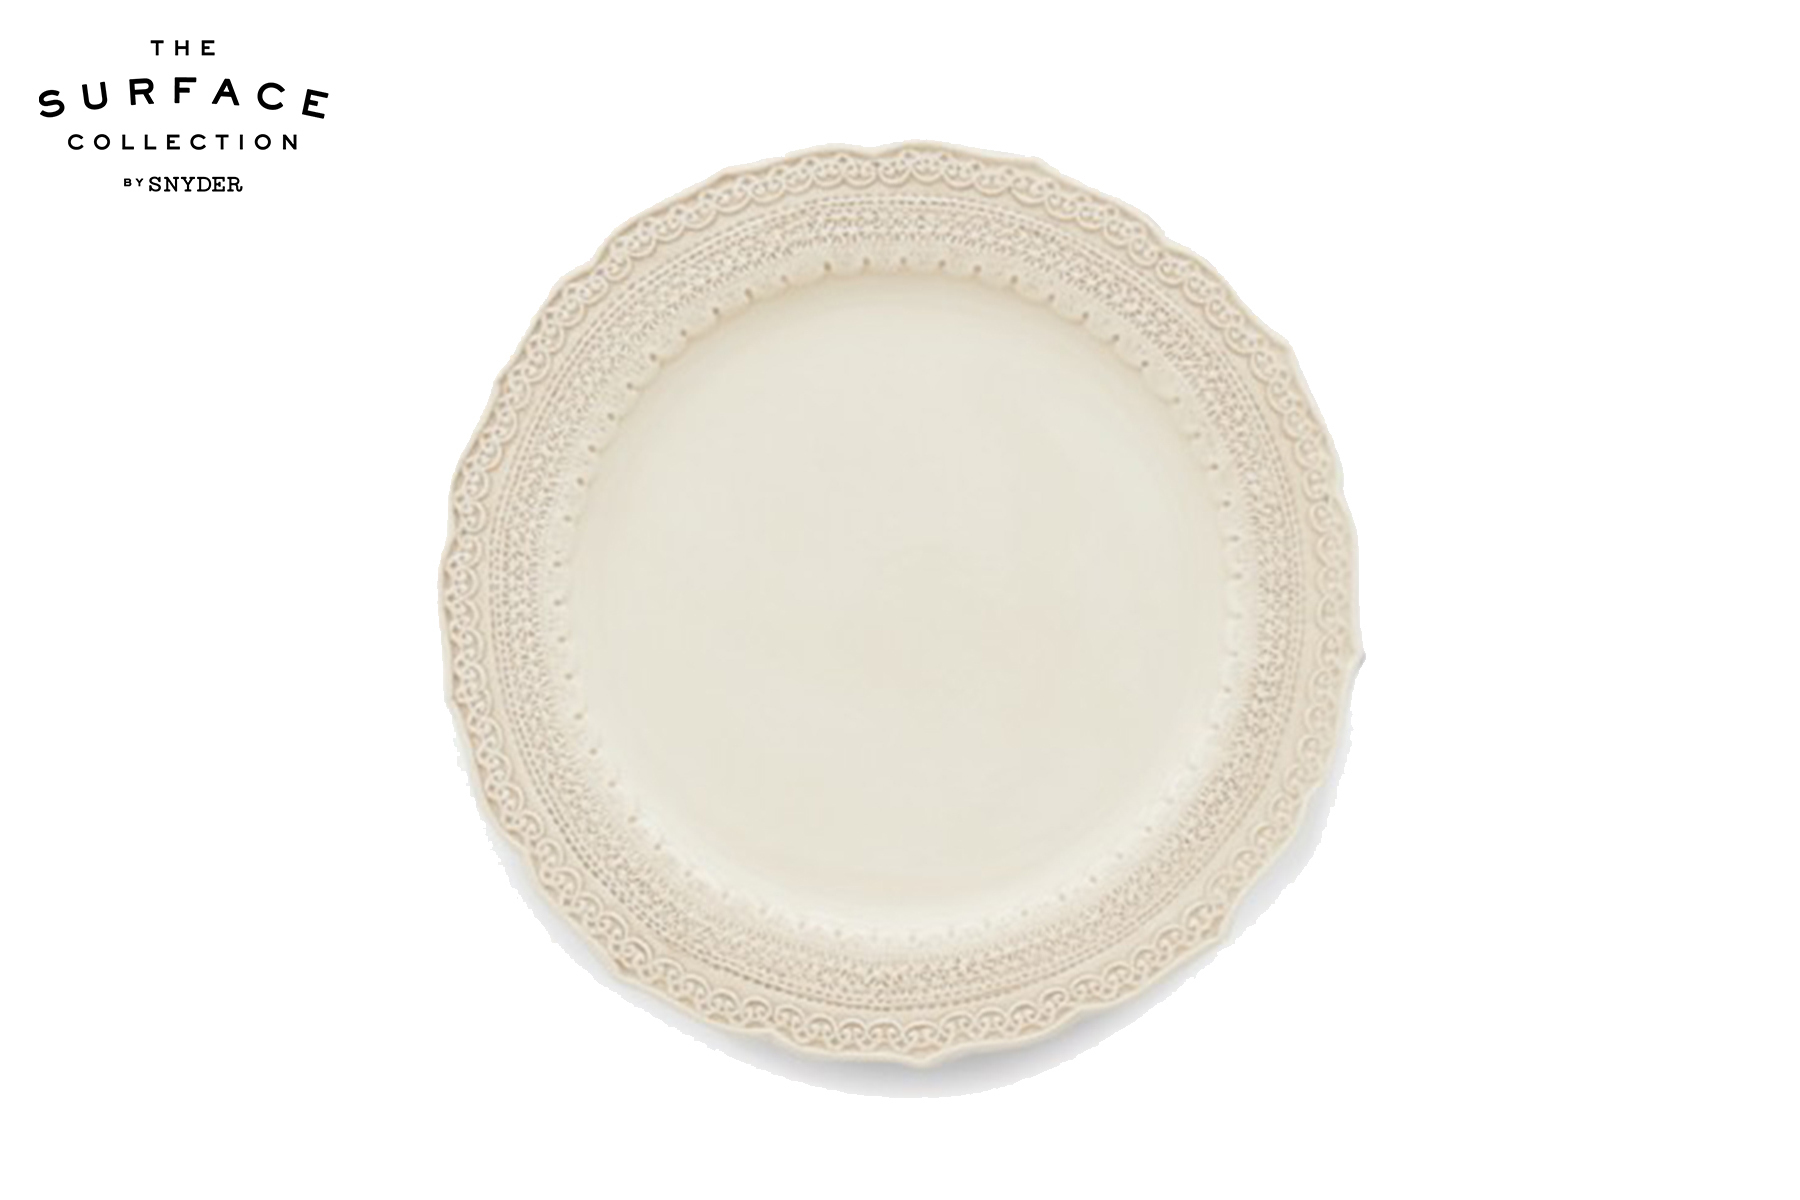 Cream Lace Dinner